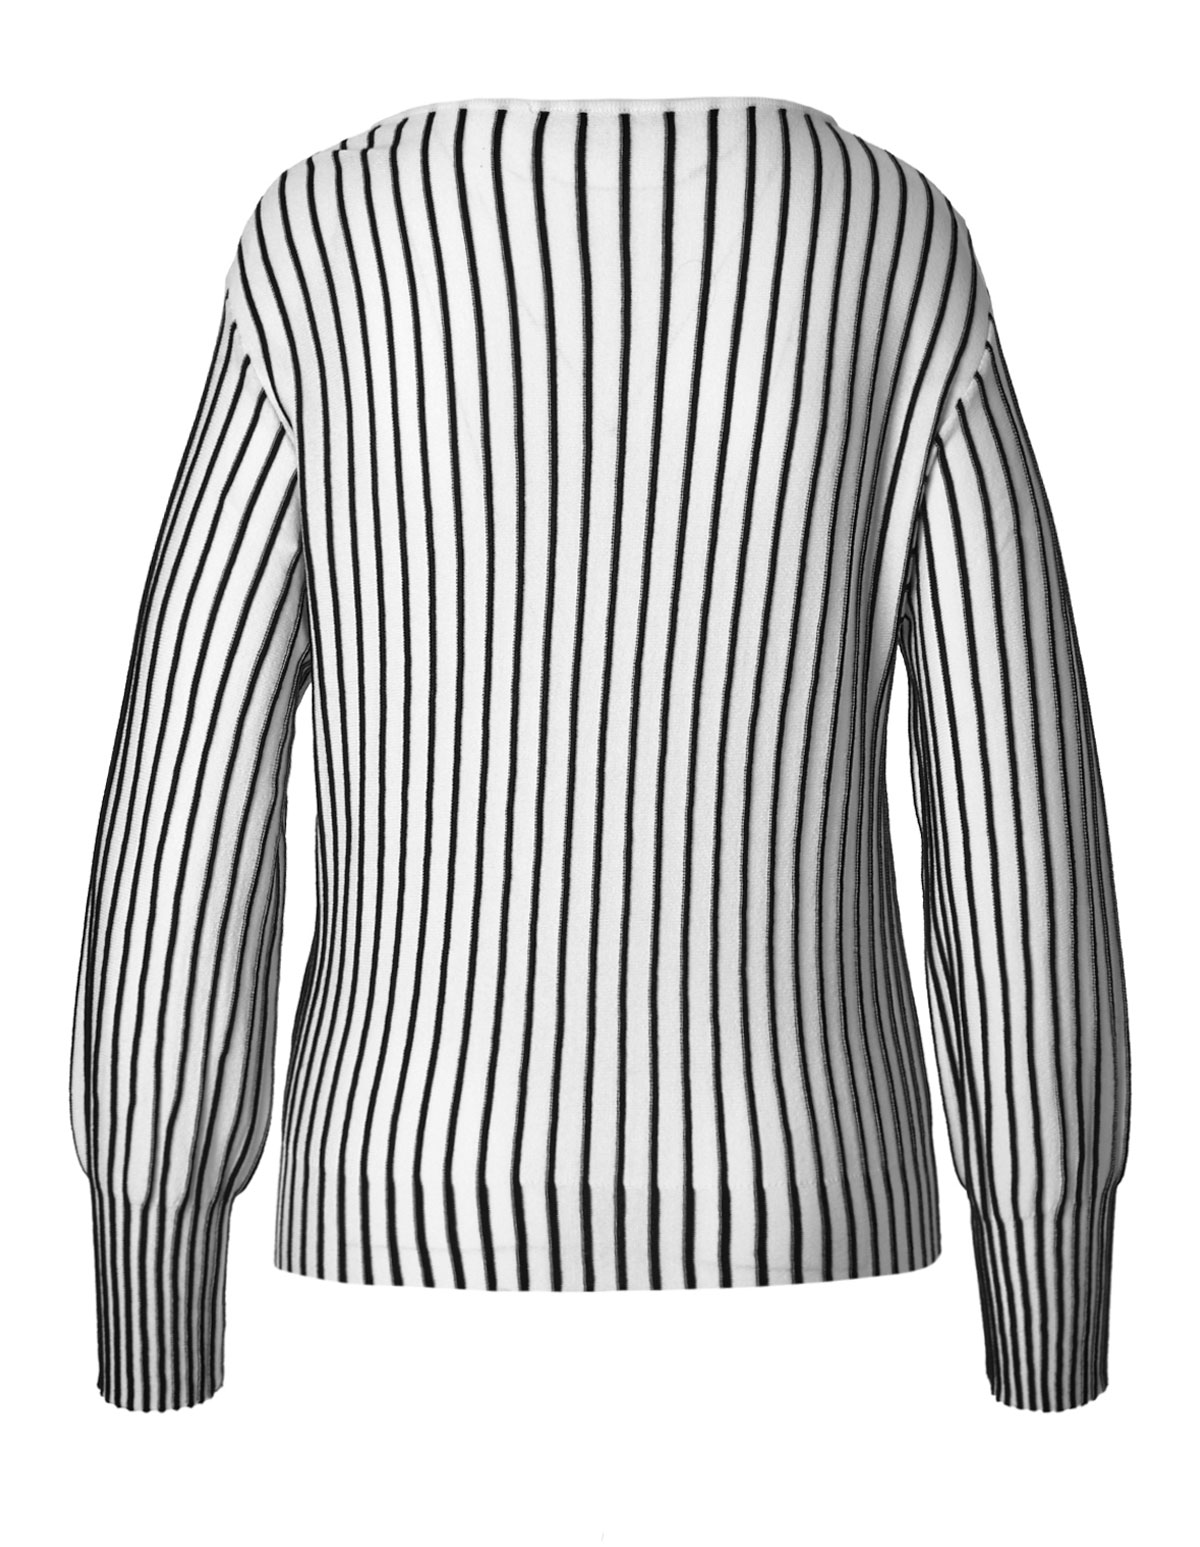 ecfc7ab1f5 ... Black   White Striped Pullover Sweater